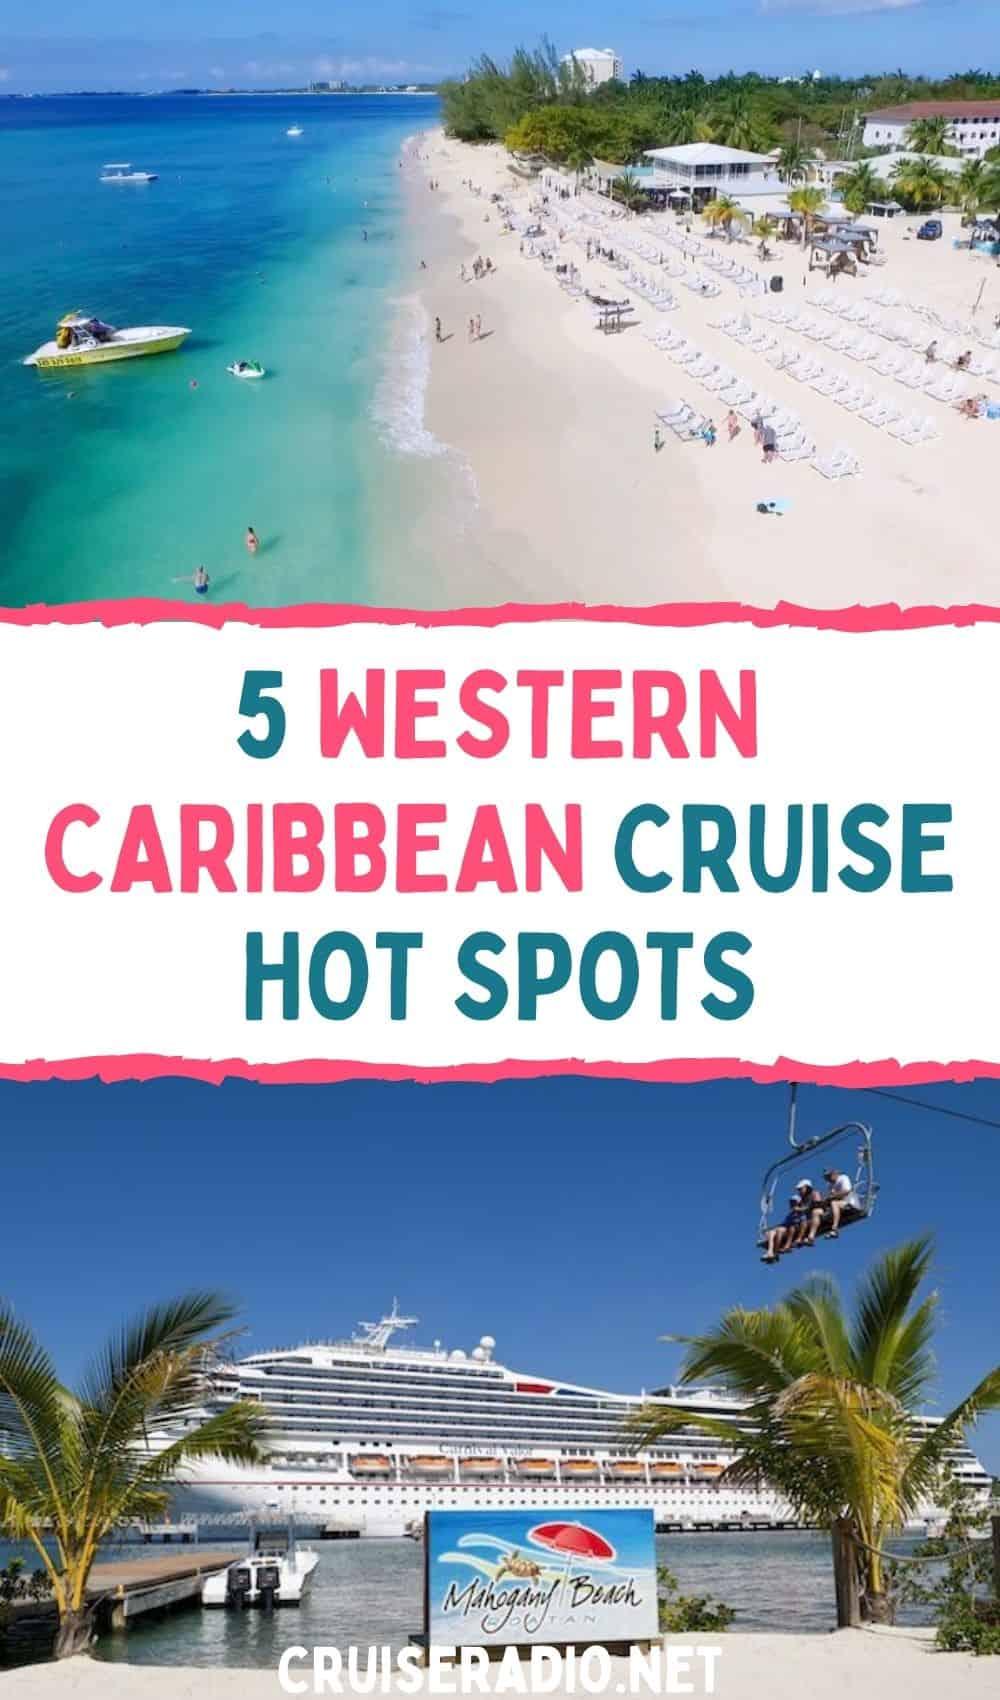 5 western caribbean cruise hot spots